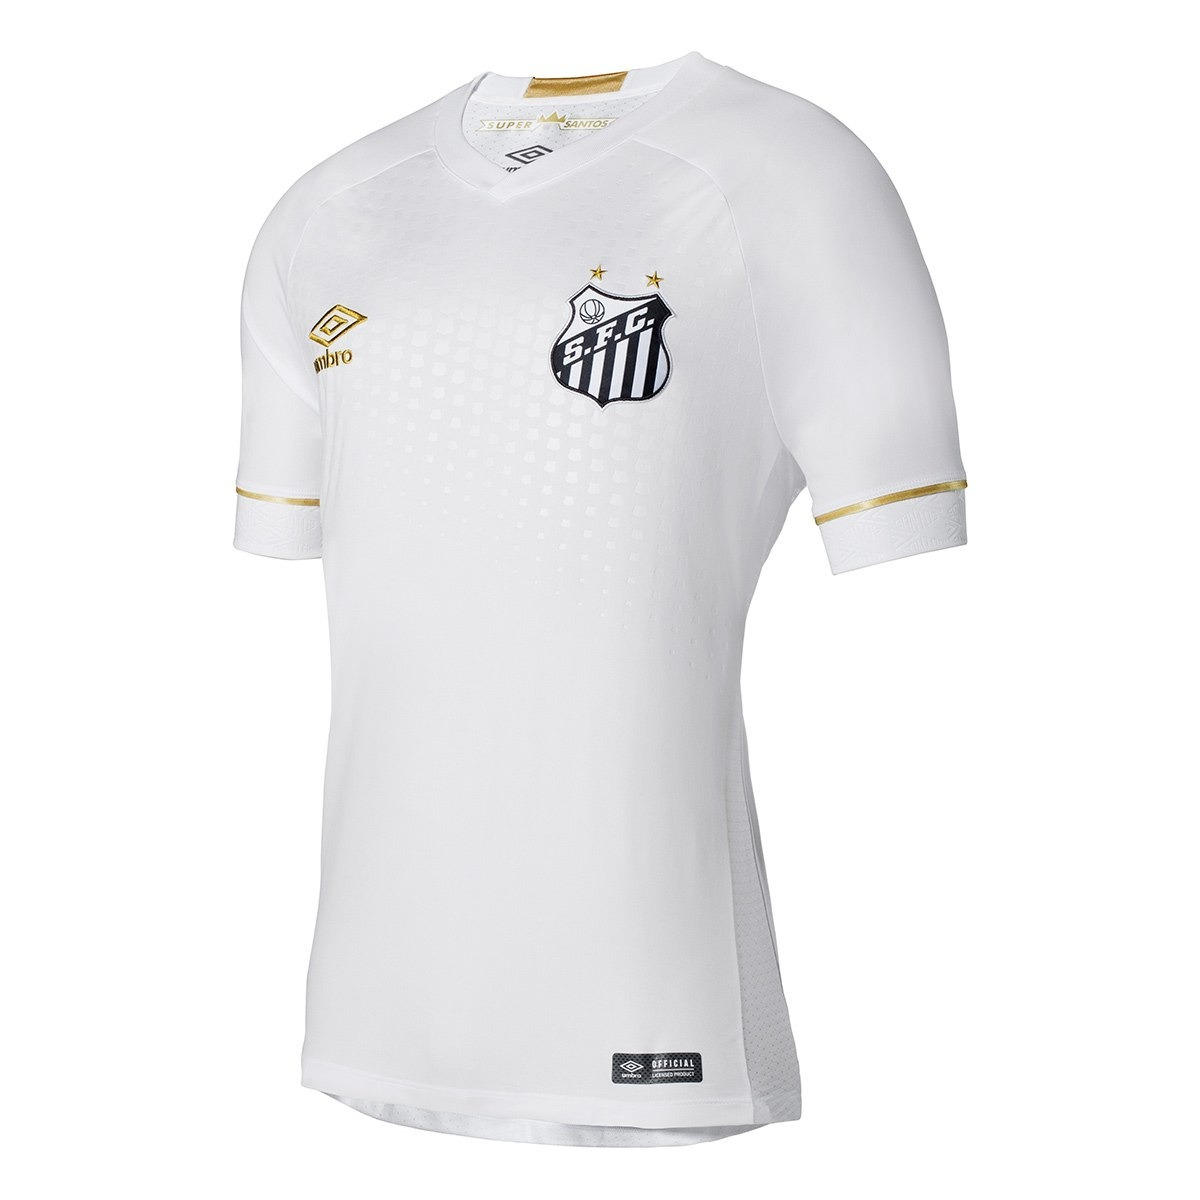 a22bf962f7 Camisa Santos 2018 - Torcedor Umbro Masculina - R  160